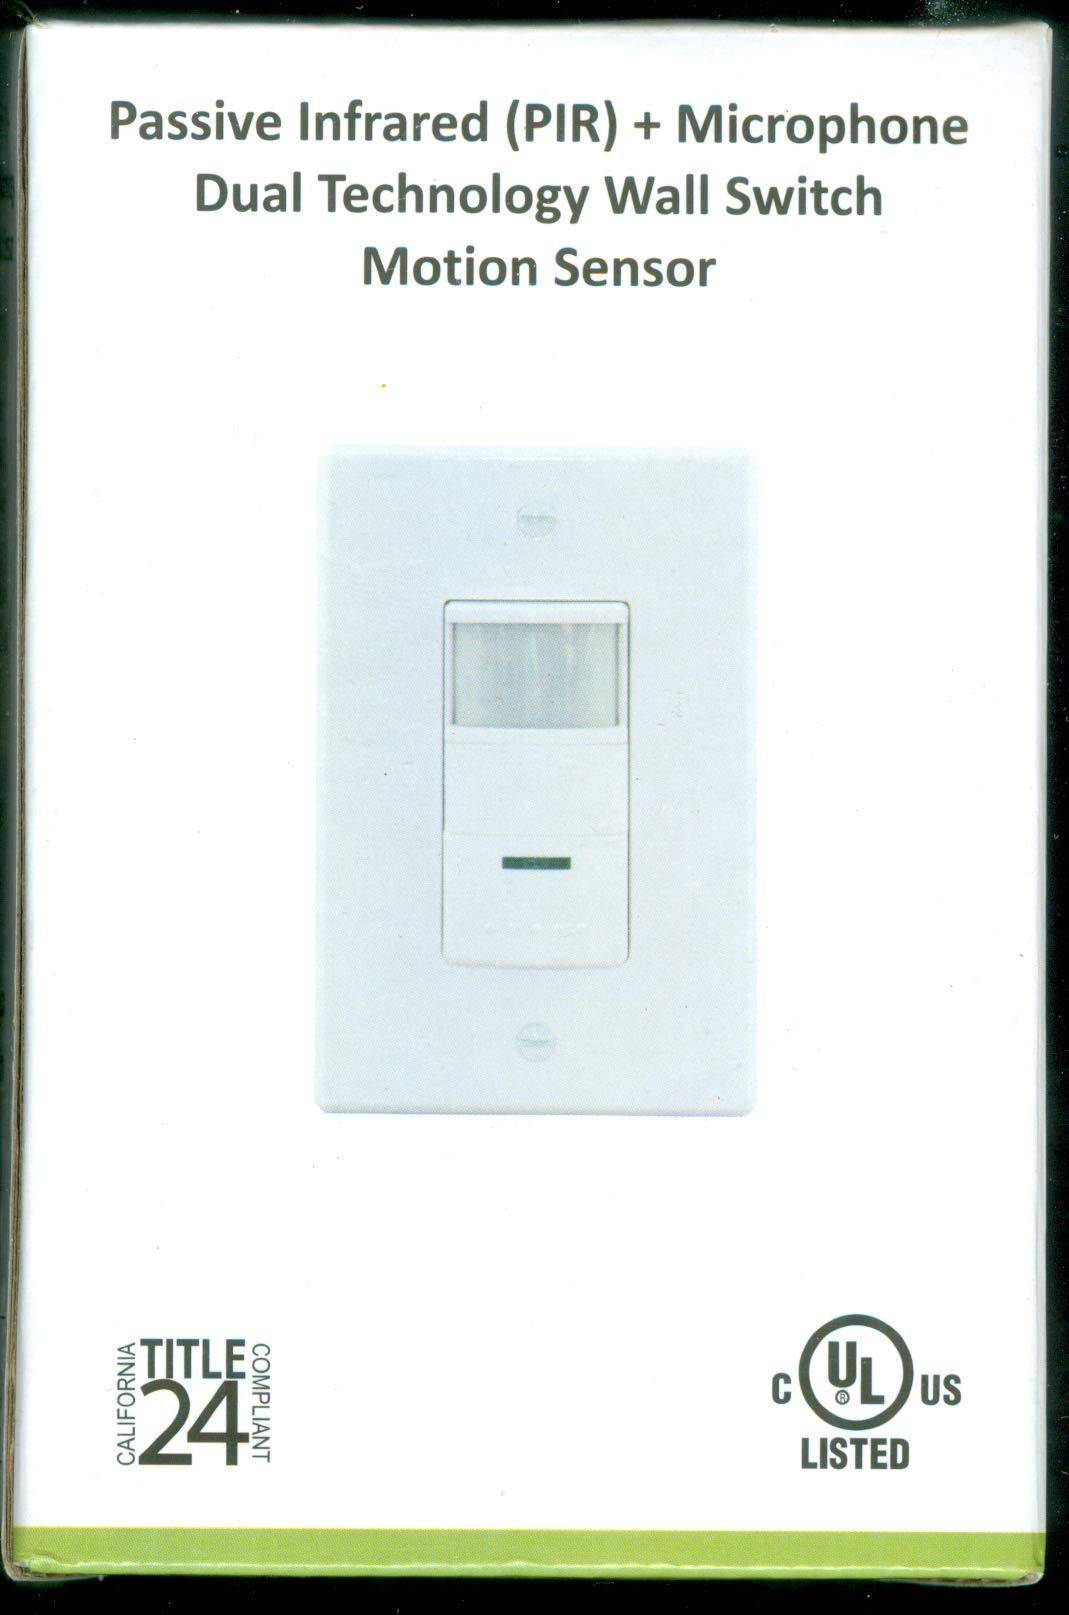 Wall Switch Motion Sensor